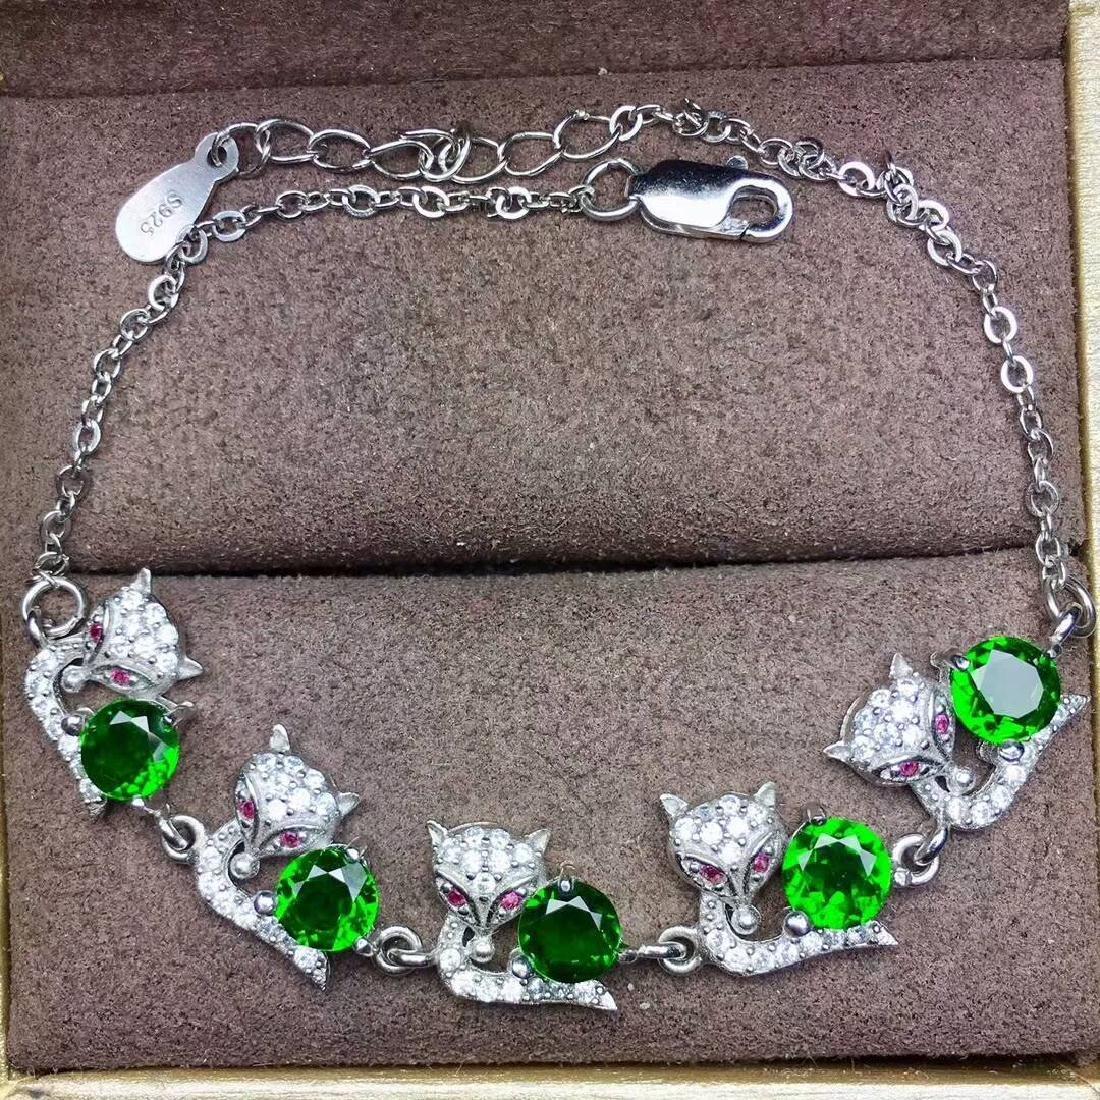 4ct Diopside Bracelets in 925 Silver - 2